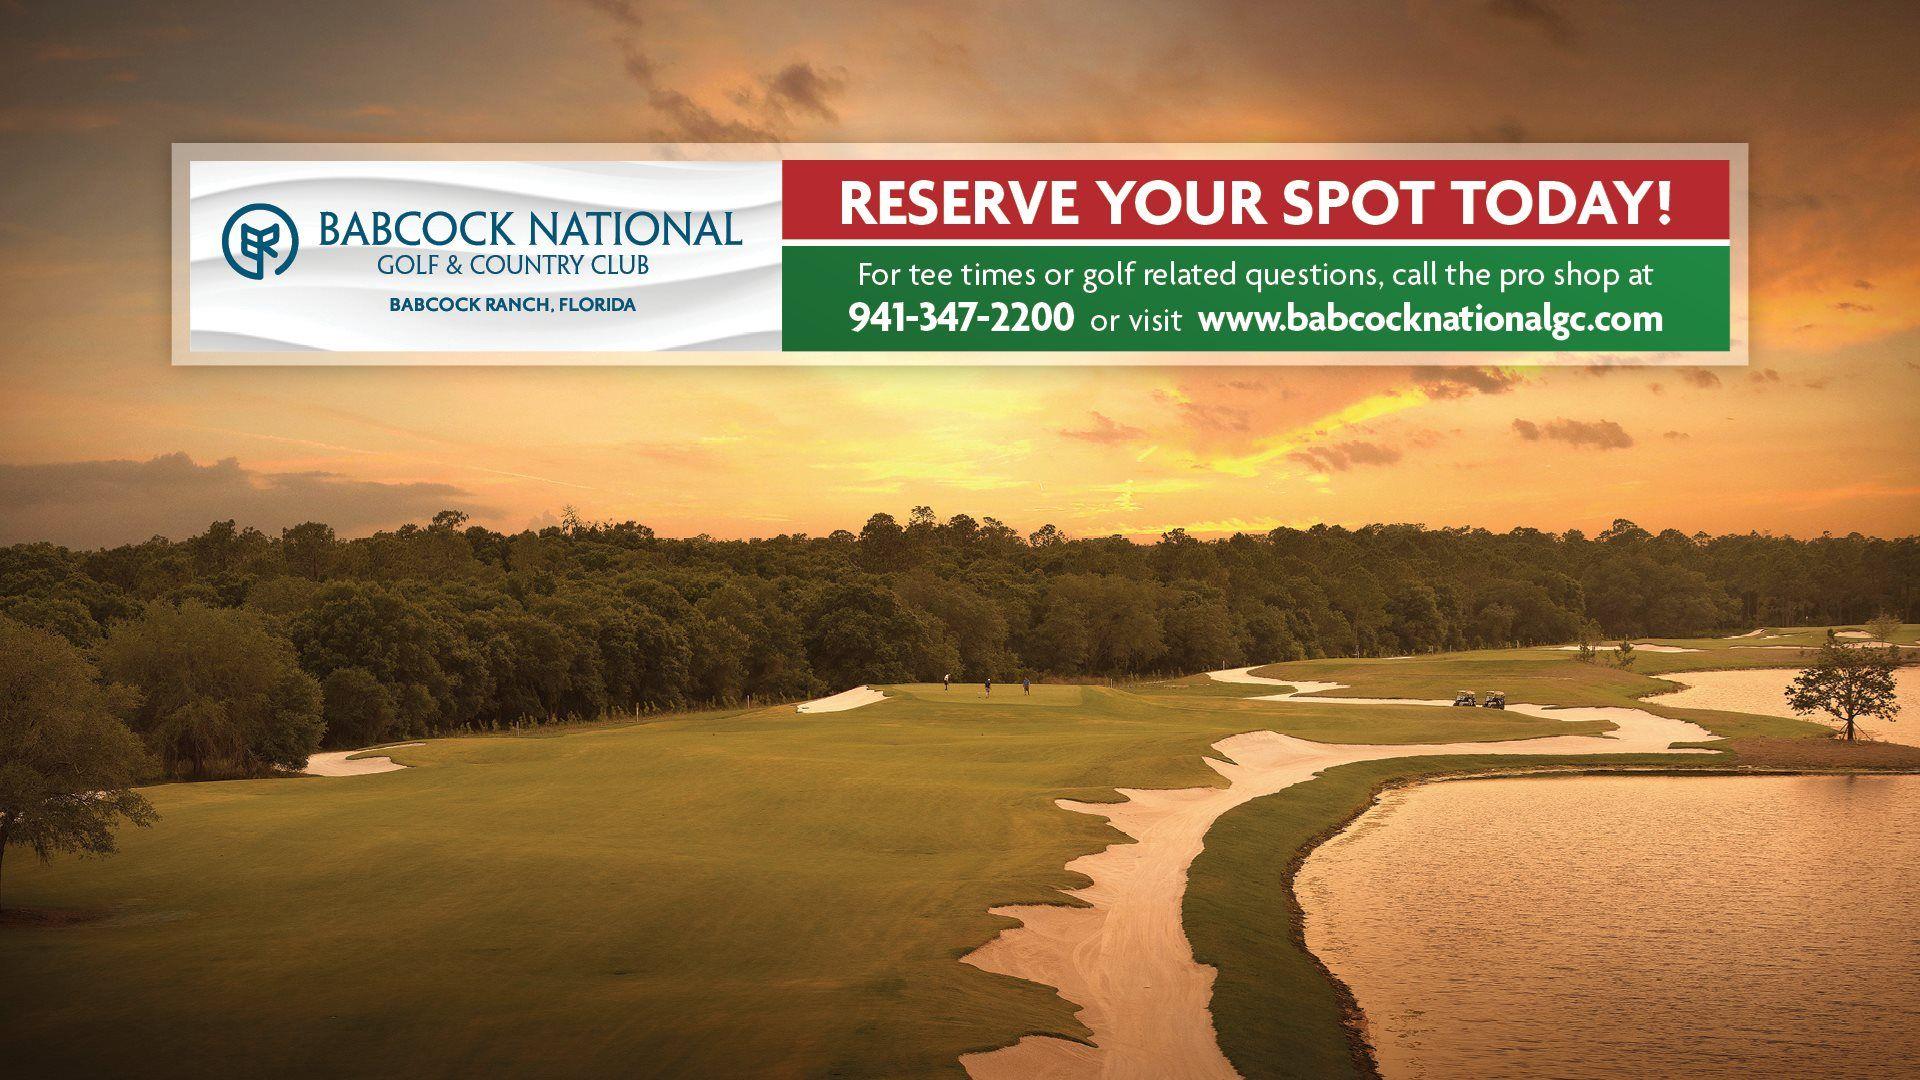 'Babcock National - Terrace Condominiums' by Lennar - SW Florida in Punta Gorda